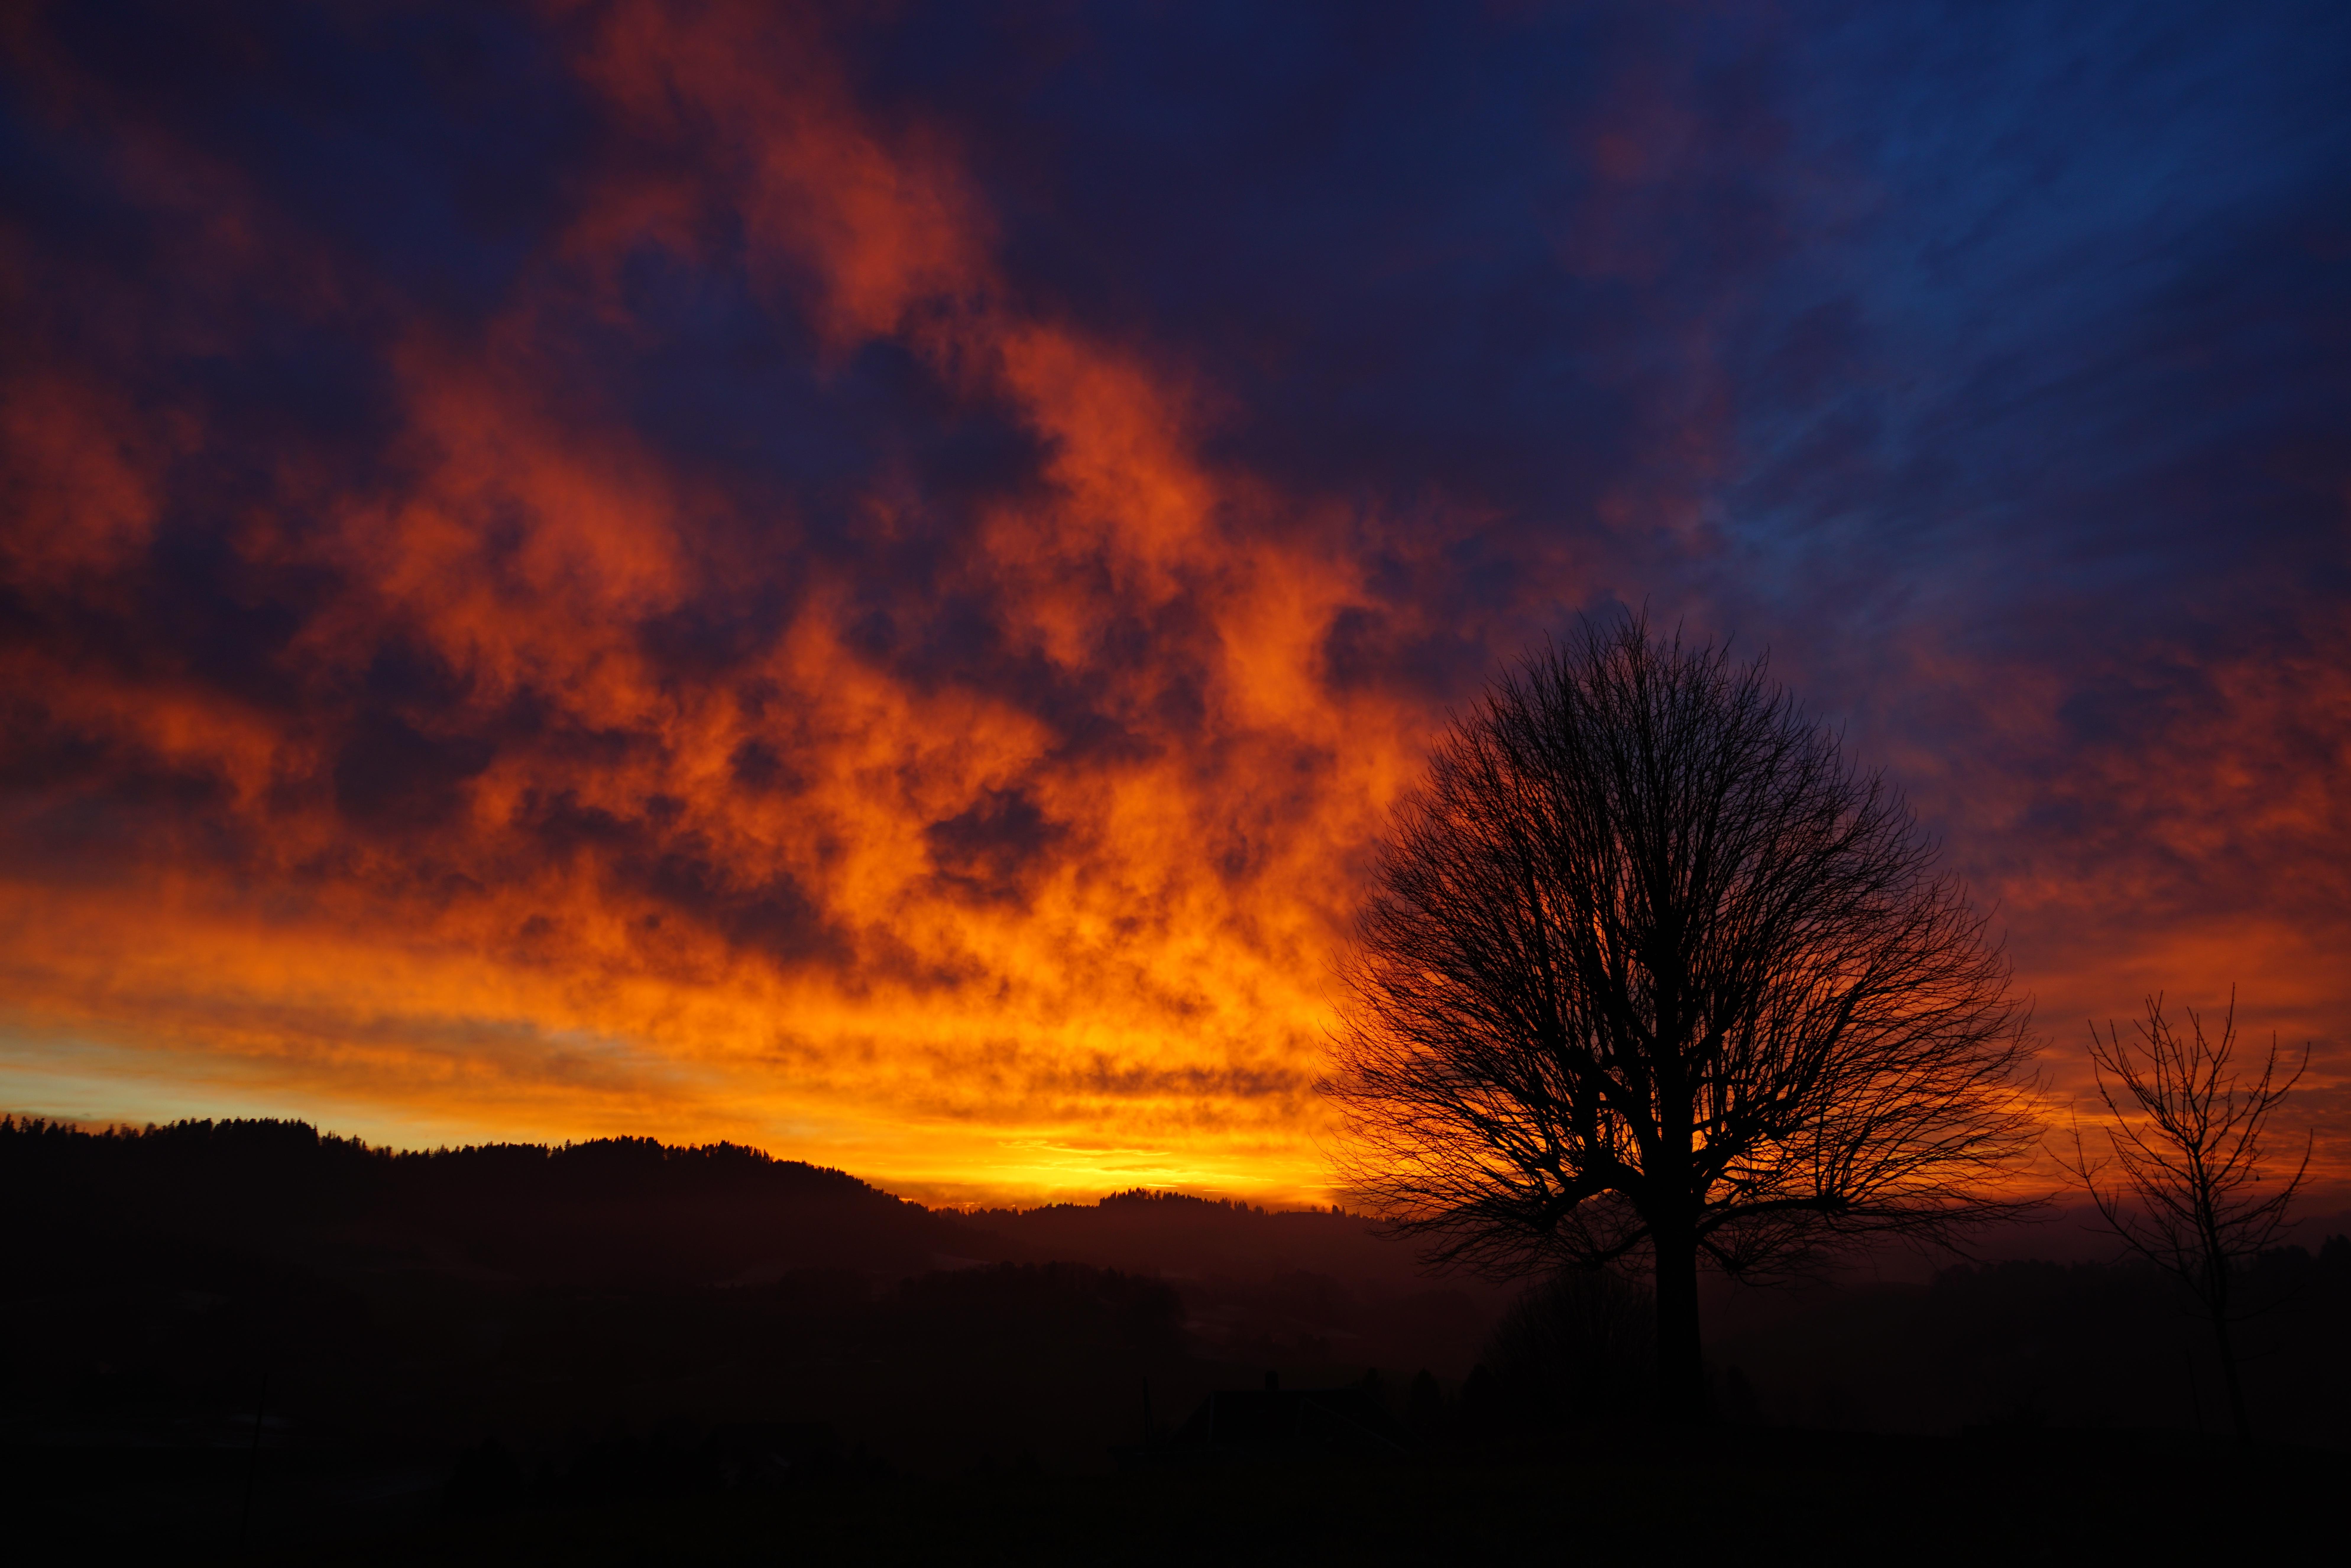 Wonderful Wallpaper Night Aesthetic - landscape-tree-nature-horizon-branch-light-glowing-cloud-sky-sun-sunrise-sunset-night-sunlight-morning-hill-dawn-atmosphere-isolated-dusk-daytime-evening-orange-red-cumulus-darkness-yellow-tribe-aesthetic-clouds-branches-switzerland-fiery-abendstimmung-clouded-sky-afterglow-evening-sky-back-light-phenomenon-individually-meteorological-phenomenon-single-trees-single-standing-solitary-tree-atmosphere-of-earth-computer-wallpaper-geological-phenomenon-red-sky-at-morning-ecoregion-cloud-glow-burstweid-wyssachen-1377126  Picture.jpg